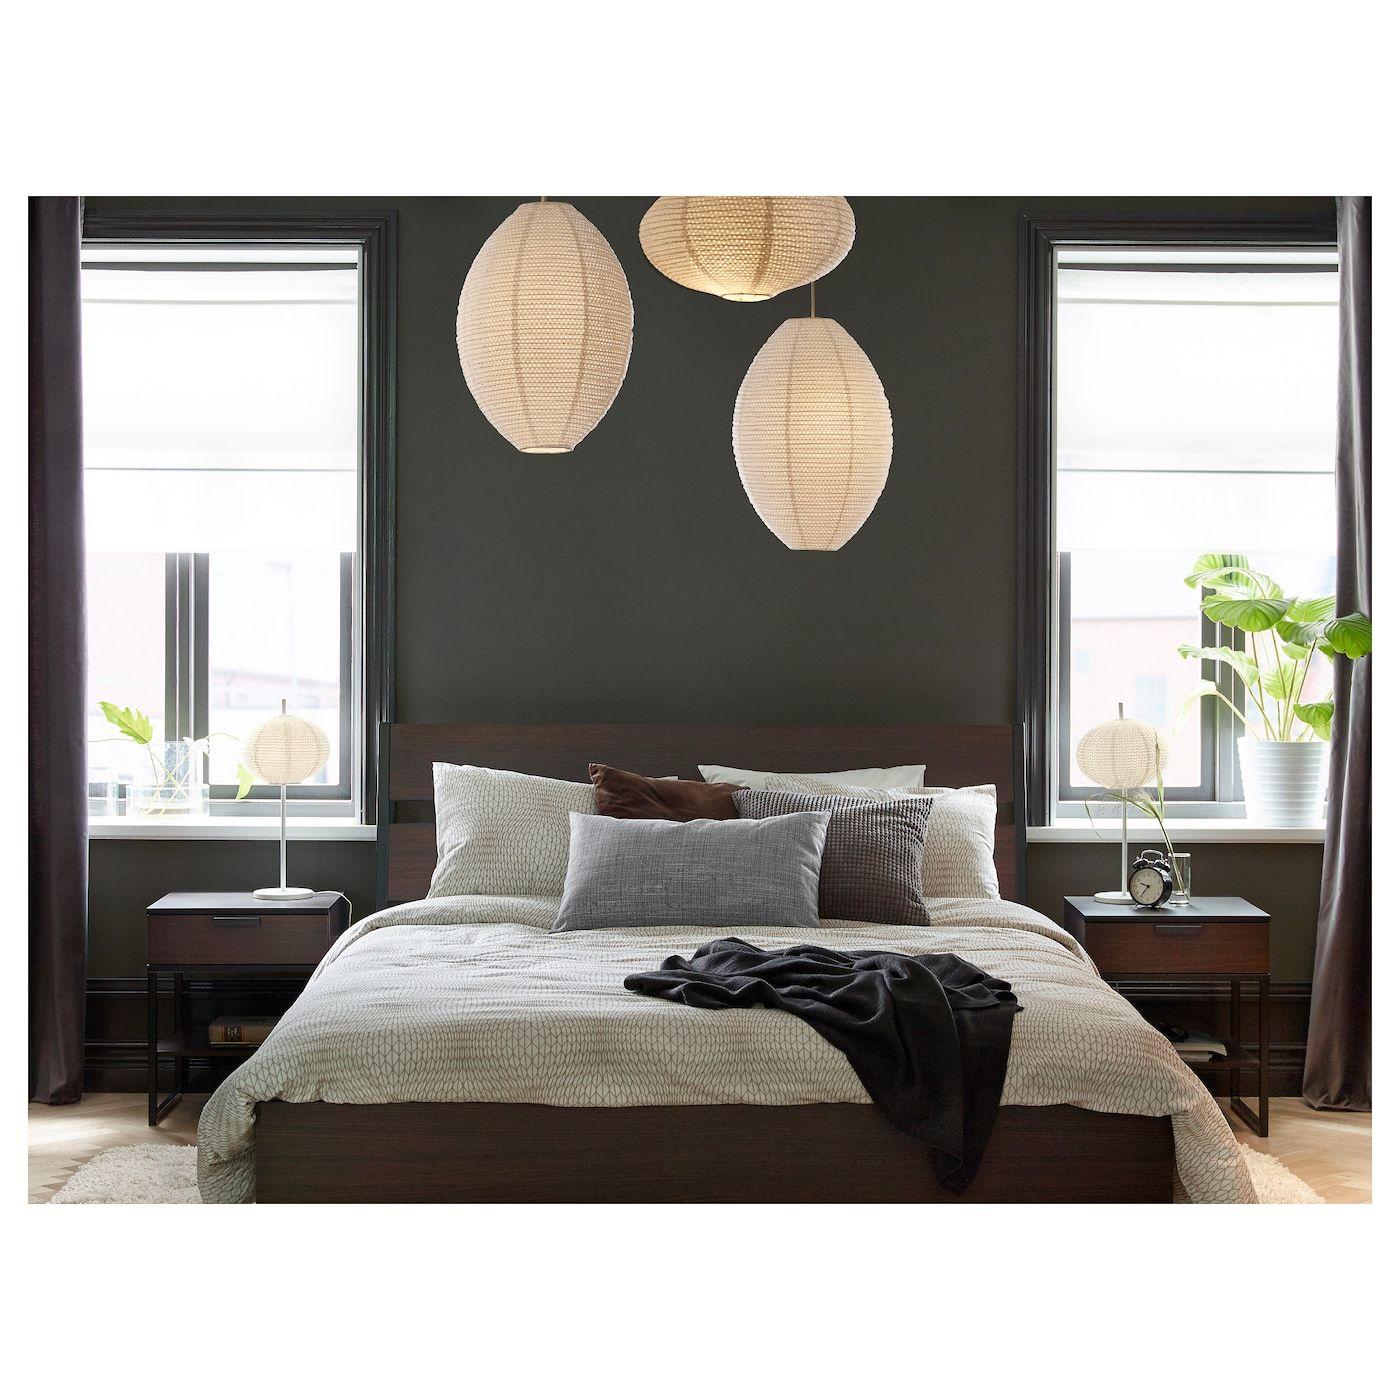 Ikea Trysil Bed Frame Dark Brown Luroy Ikea Bed Frames Bed Frame Ikea Bed